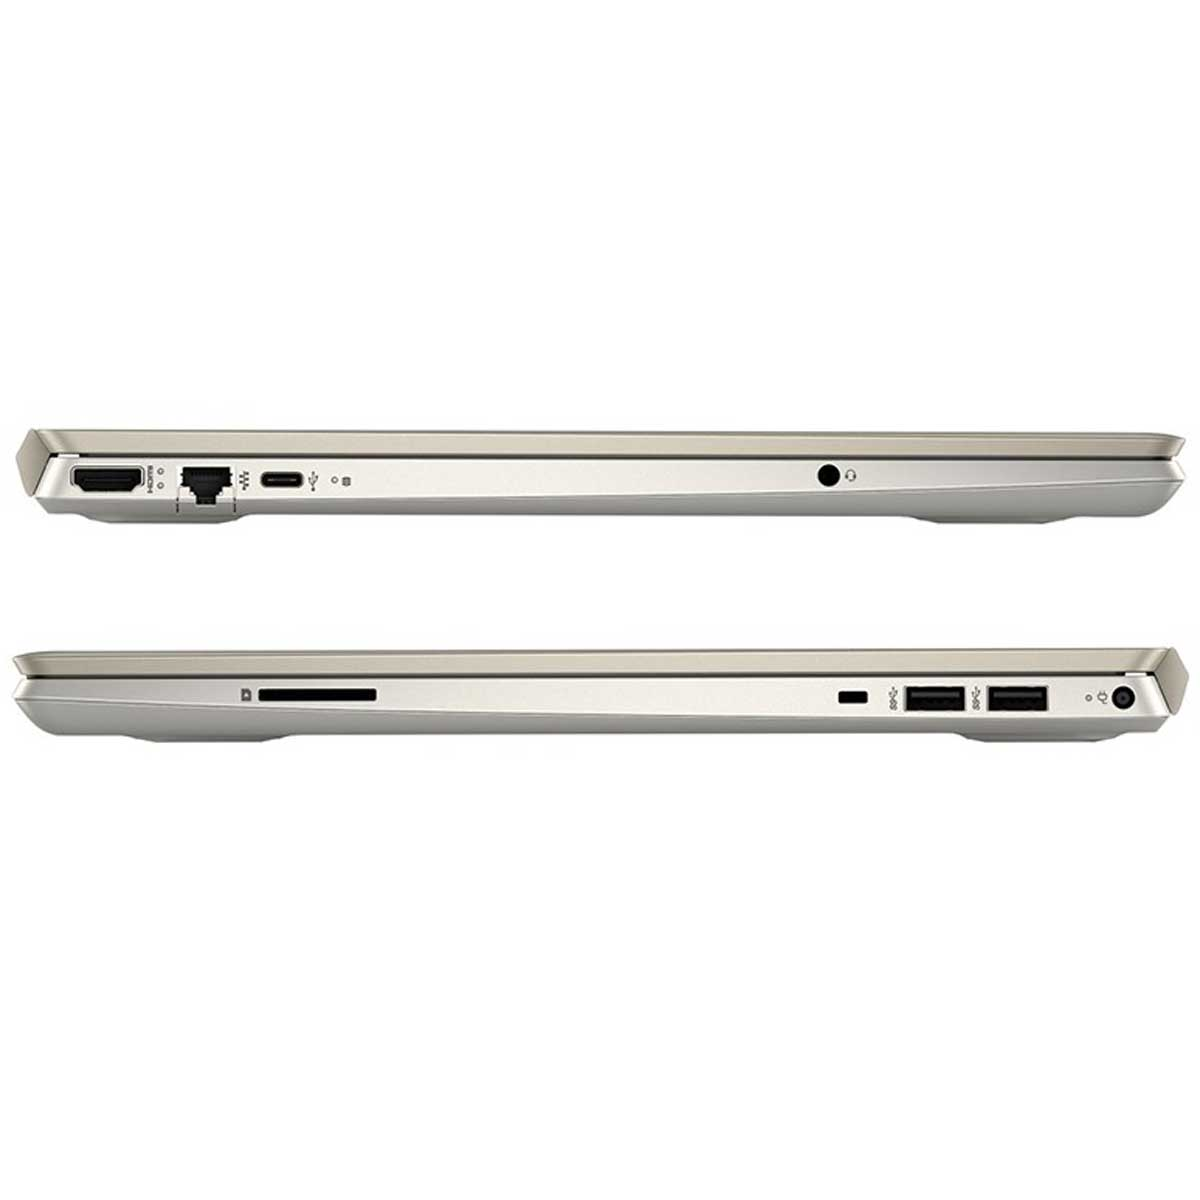 Laptop HP Pavilion 15-cs3014TU Core i5-1035G1 (8QP20PA)